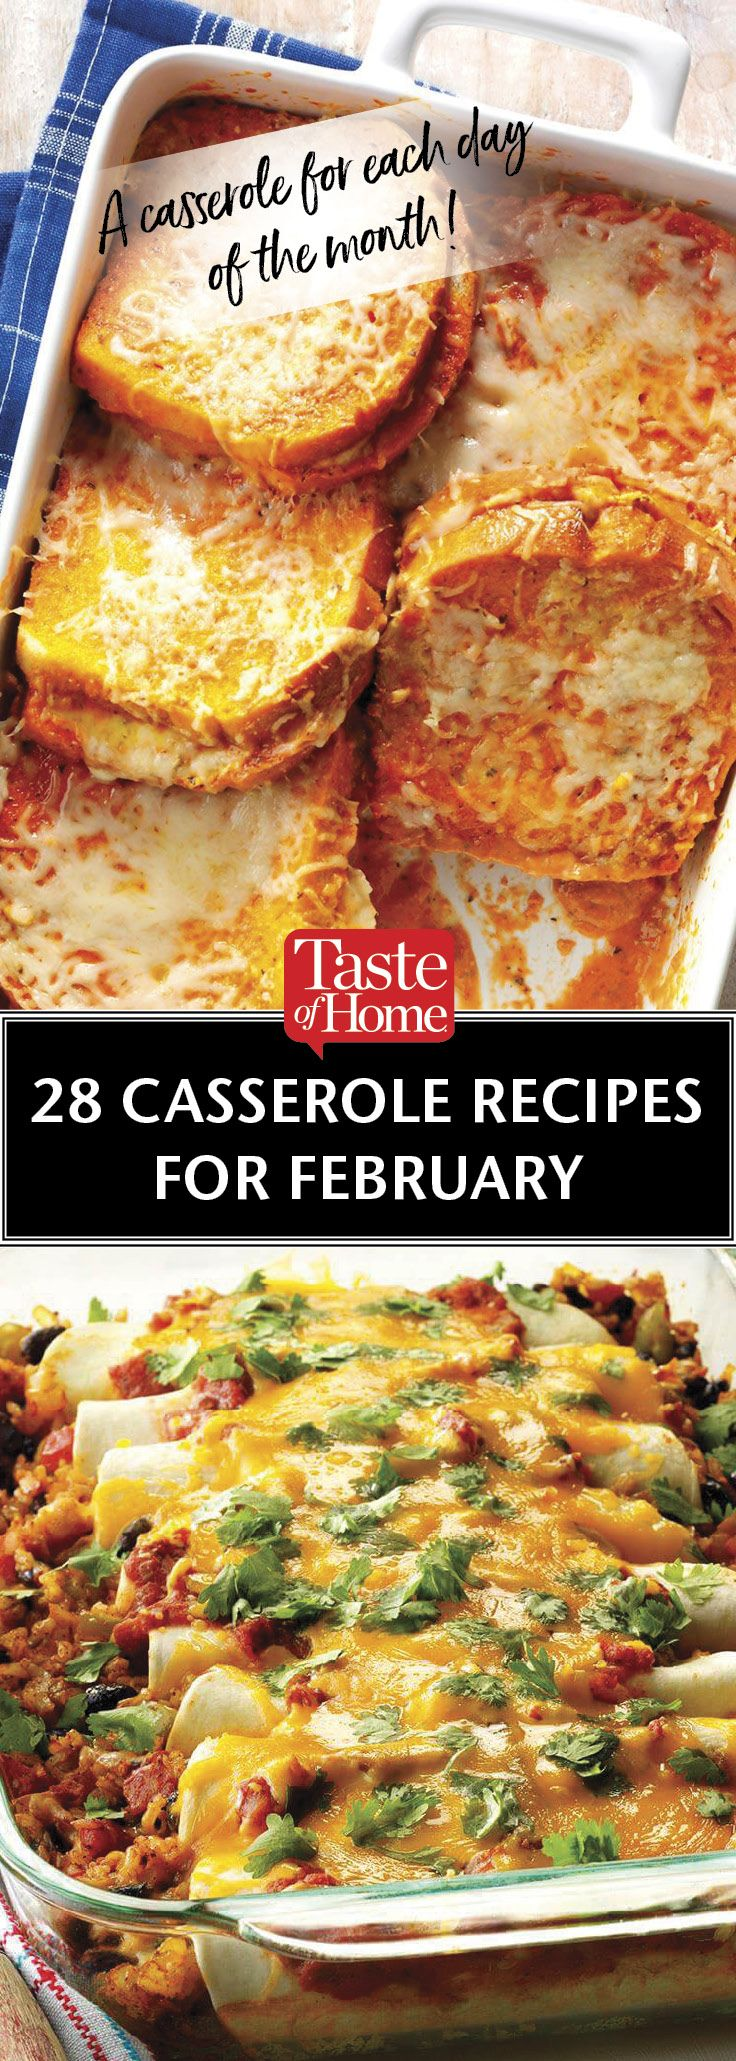 28 Casserole Recipes for February